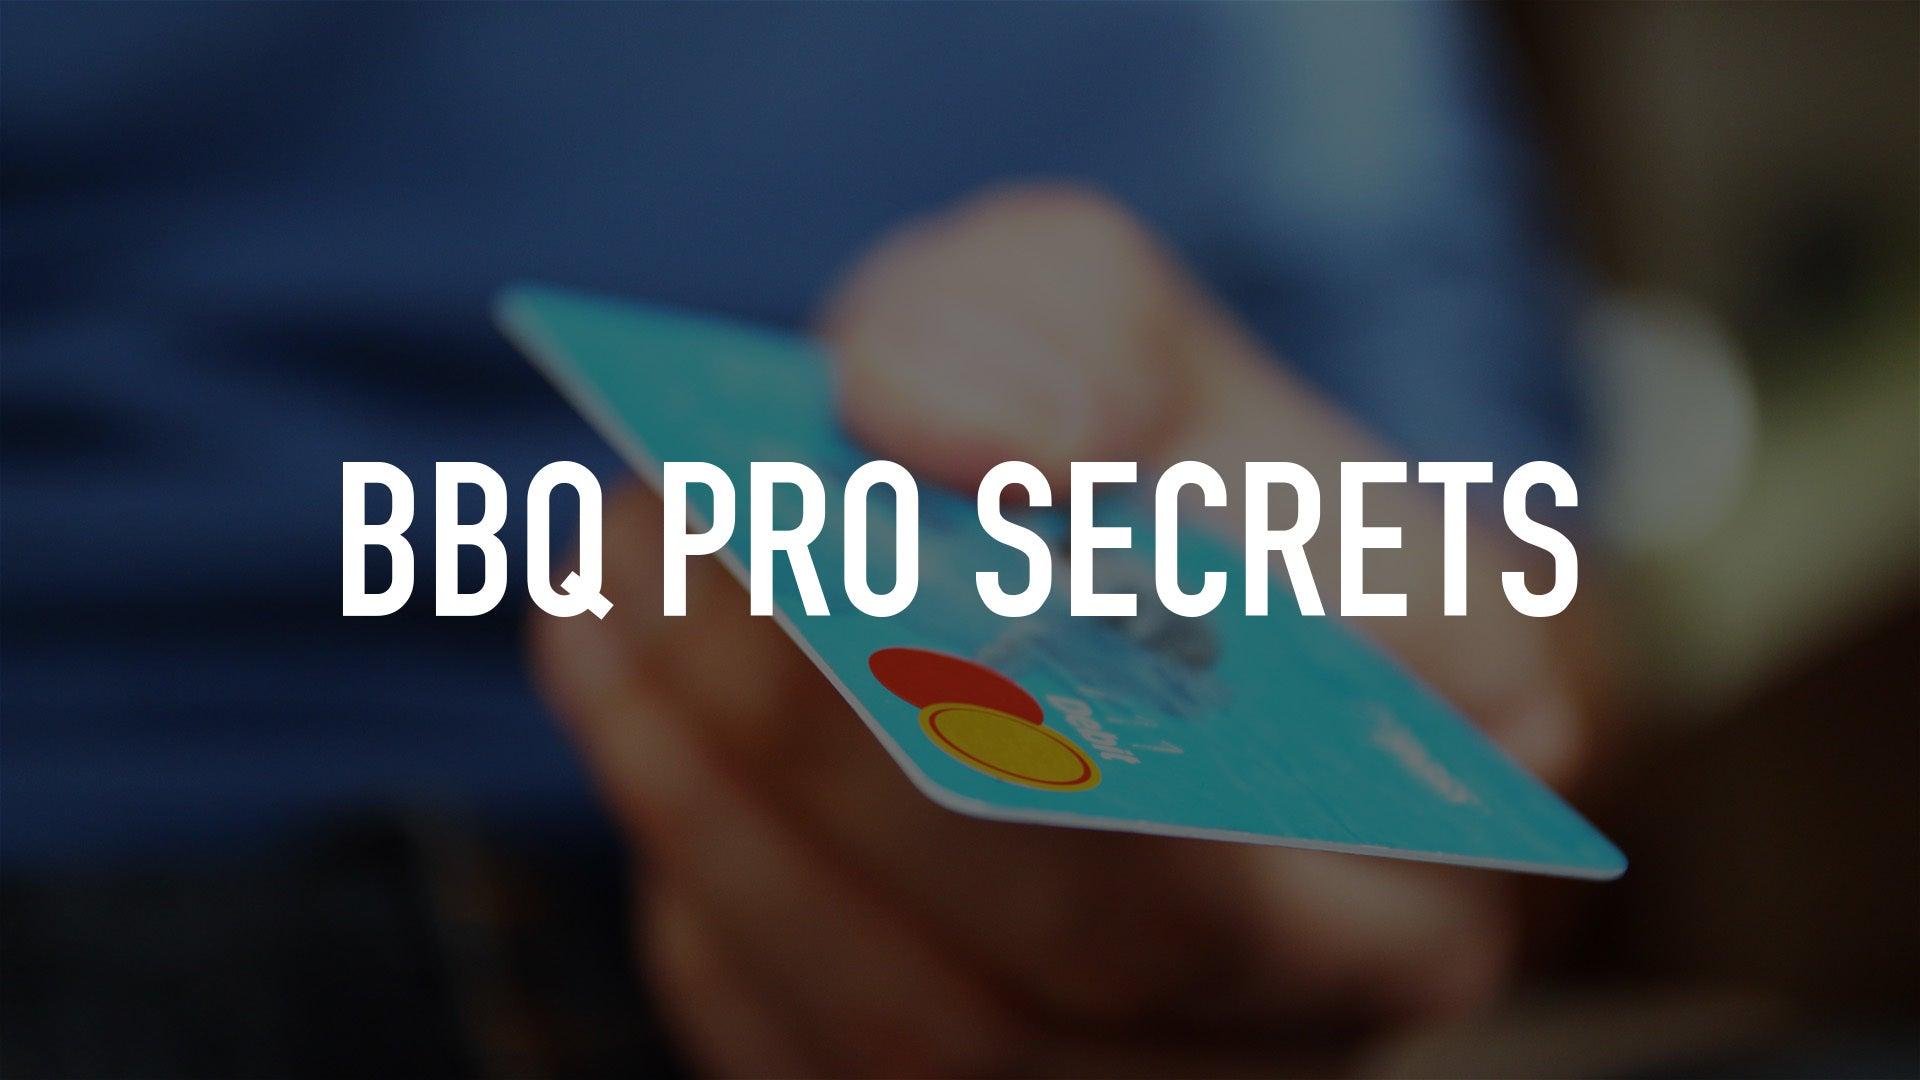 BBQ Pro Secrets